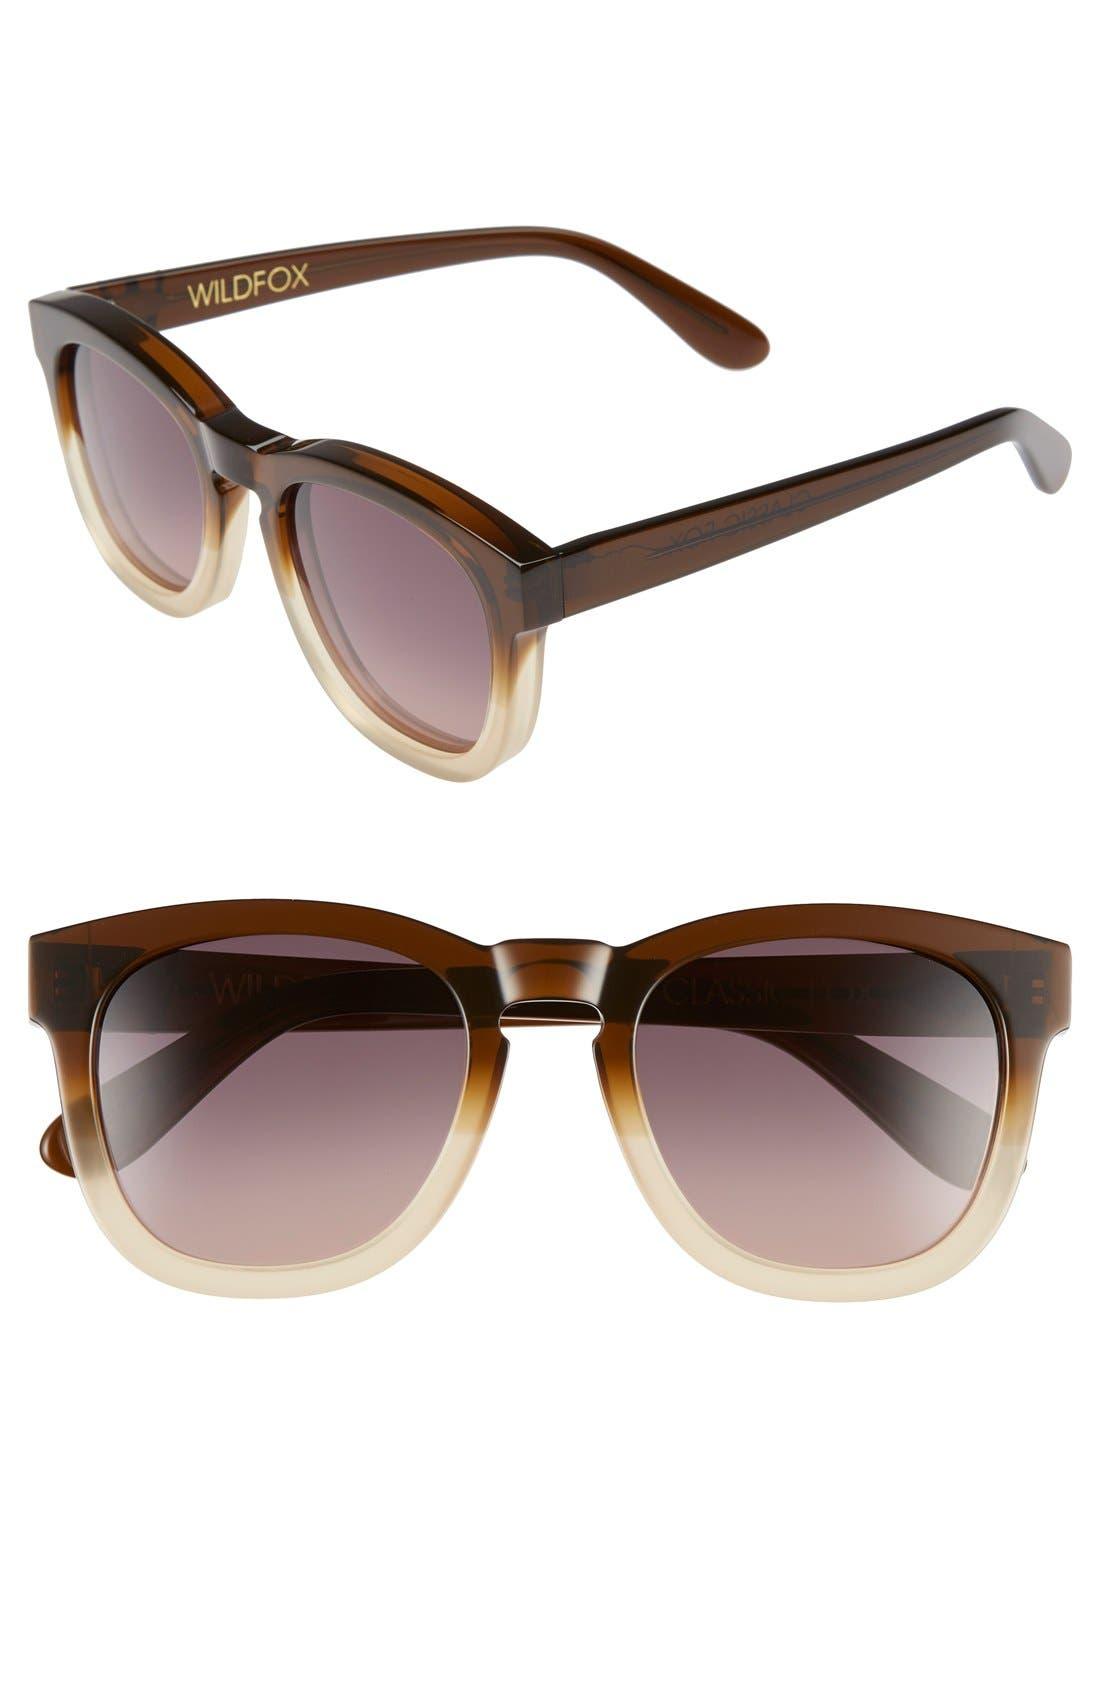 Main Image - Wildfox 'Classic Fox' 50mm Retro Sunglasses